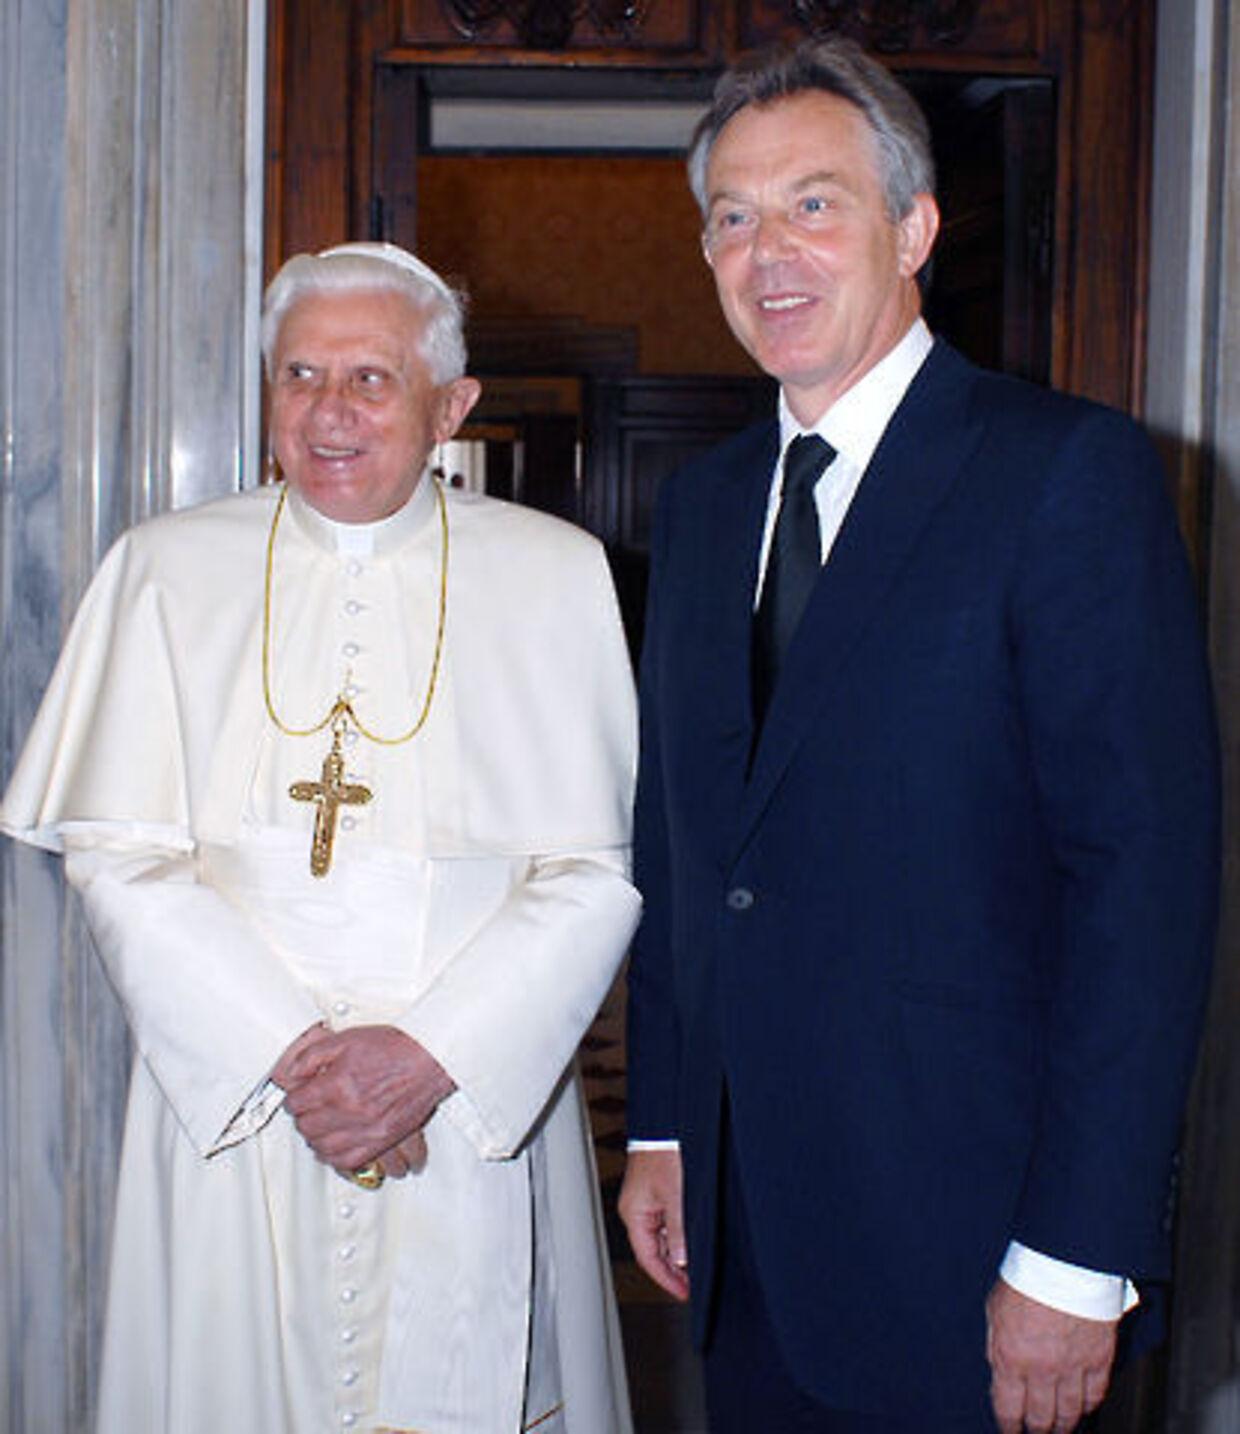 Tony Blair sammen med paven.